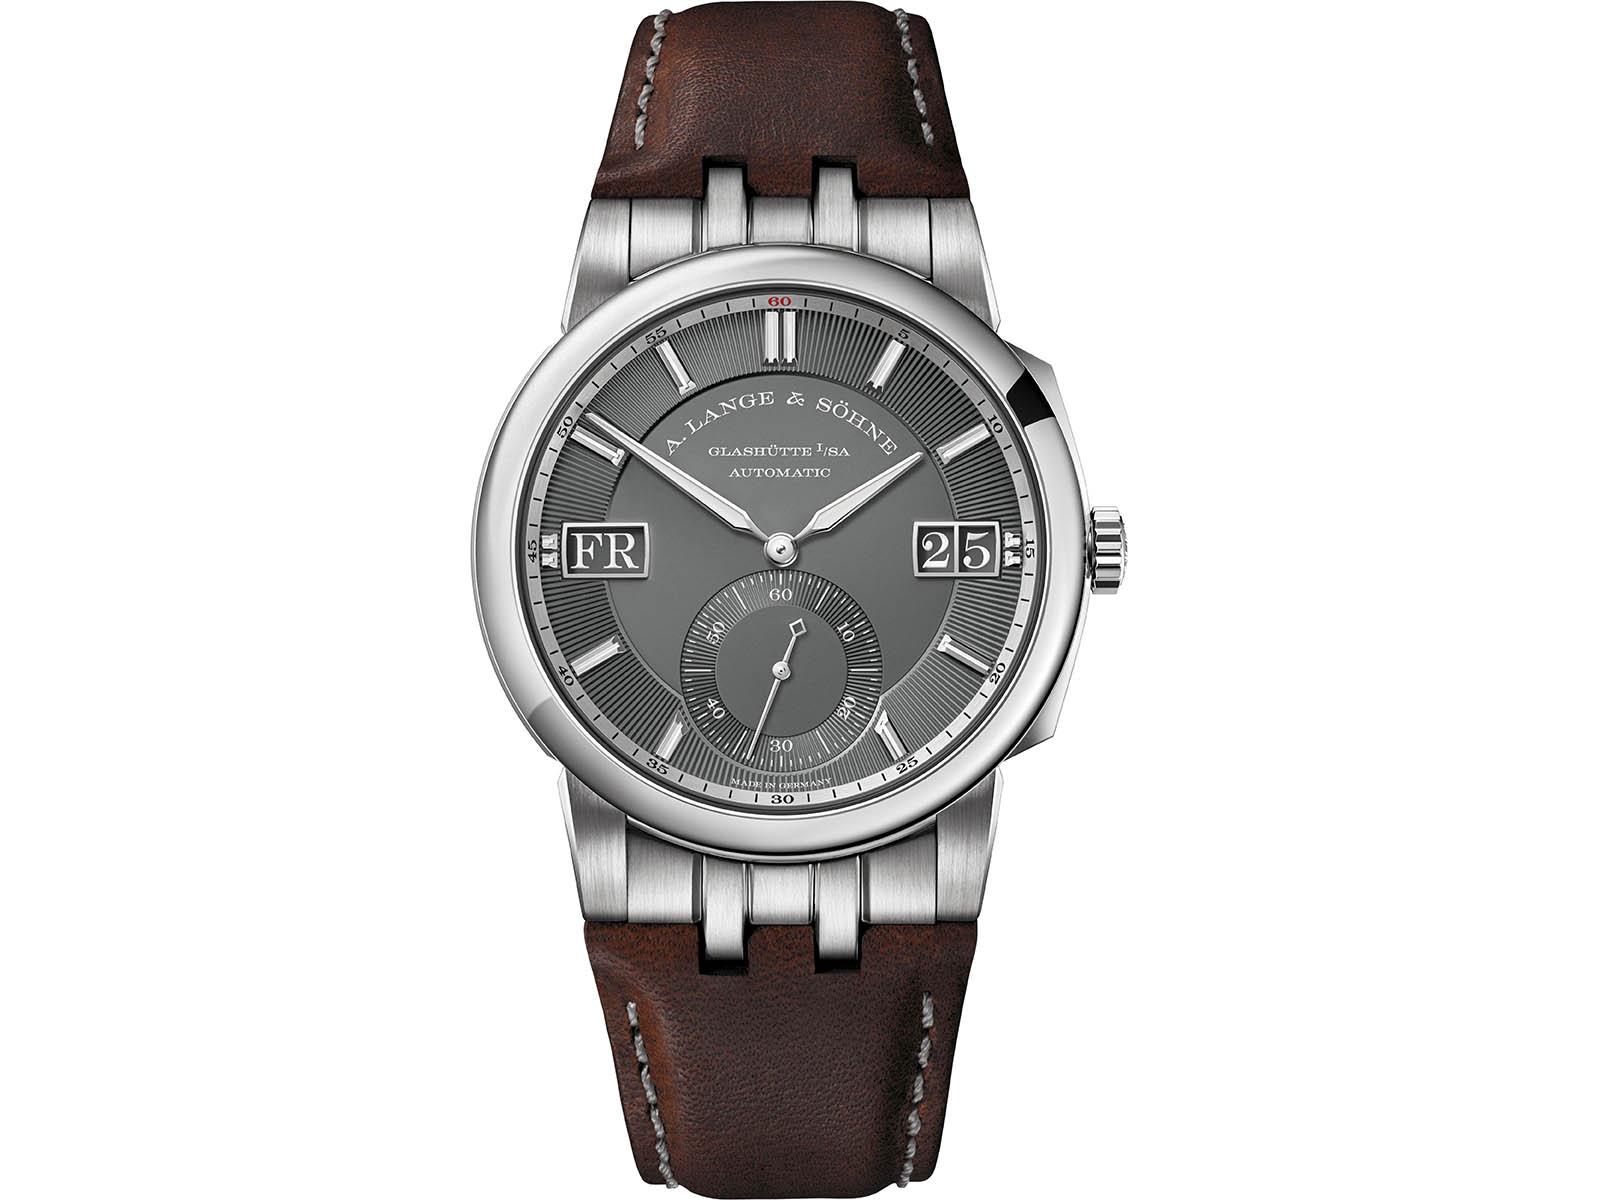 363-038-a-lange-sohne-odysseus-watch-wonders-2020-3.jpg